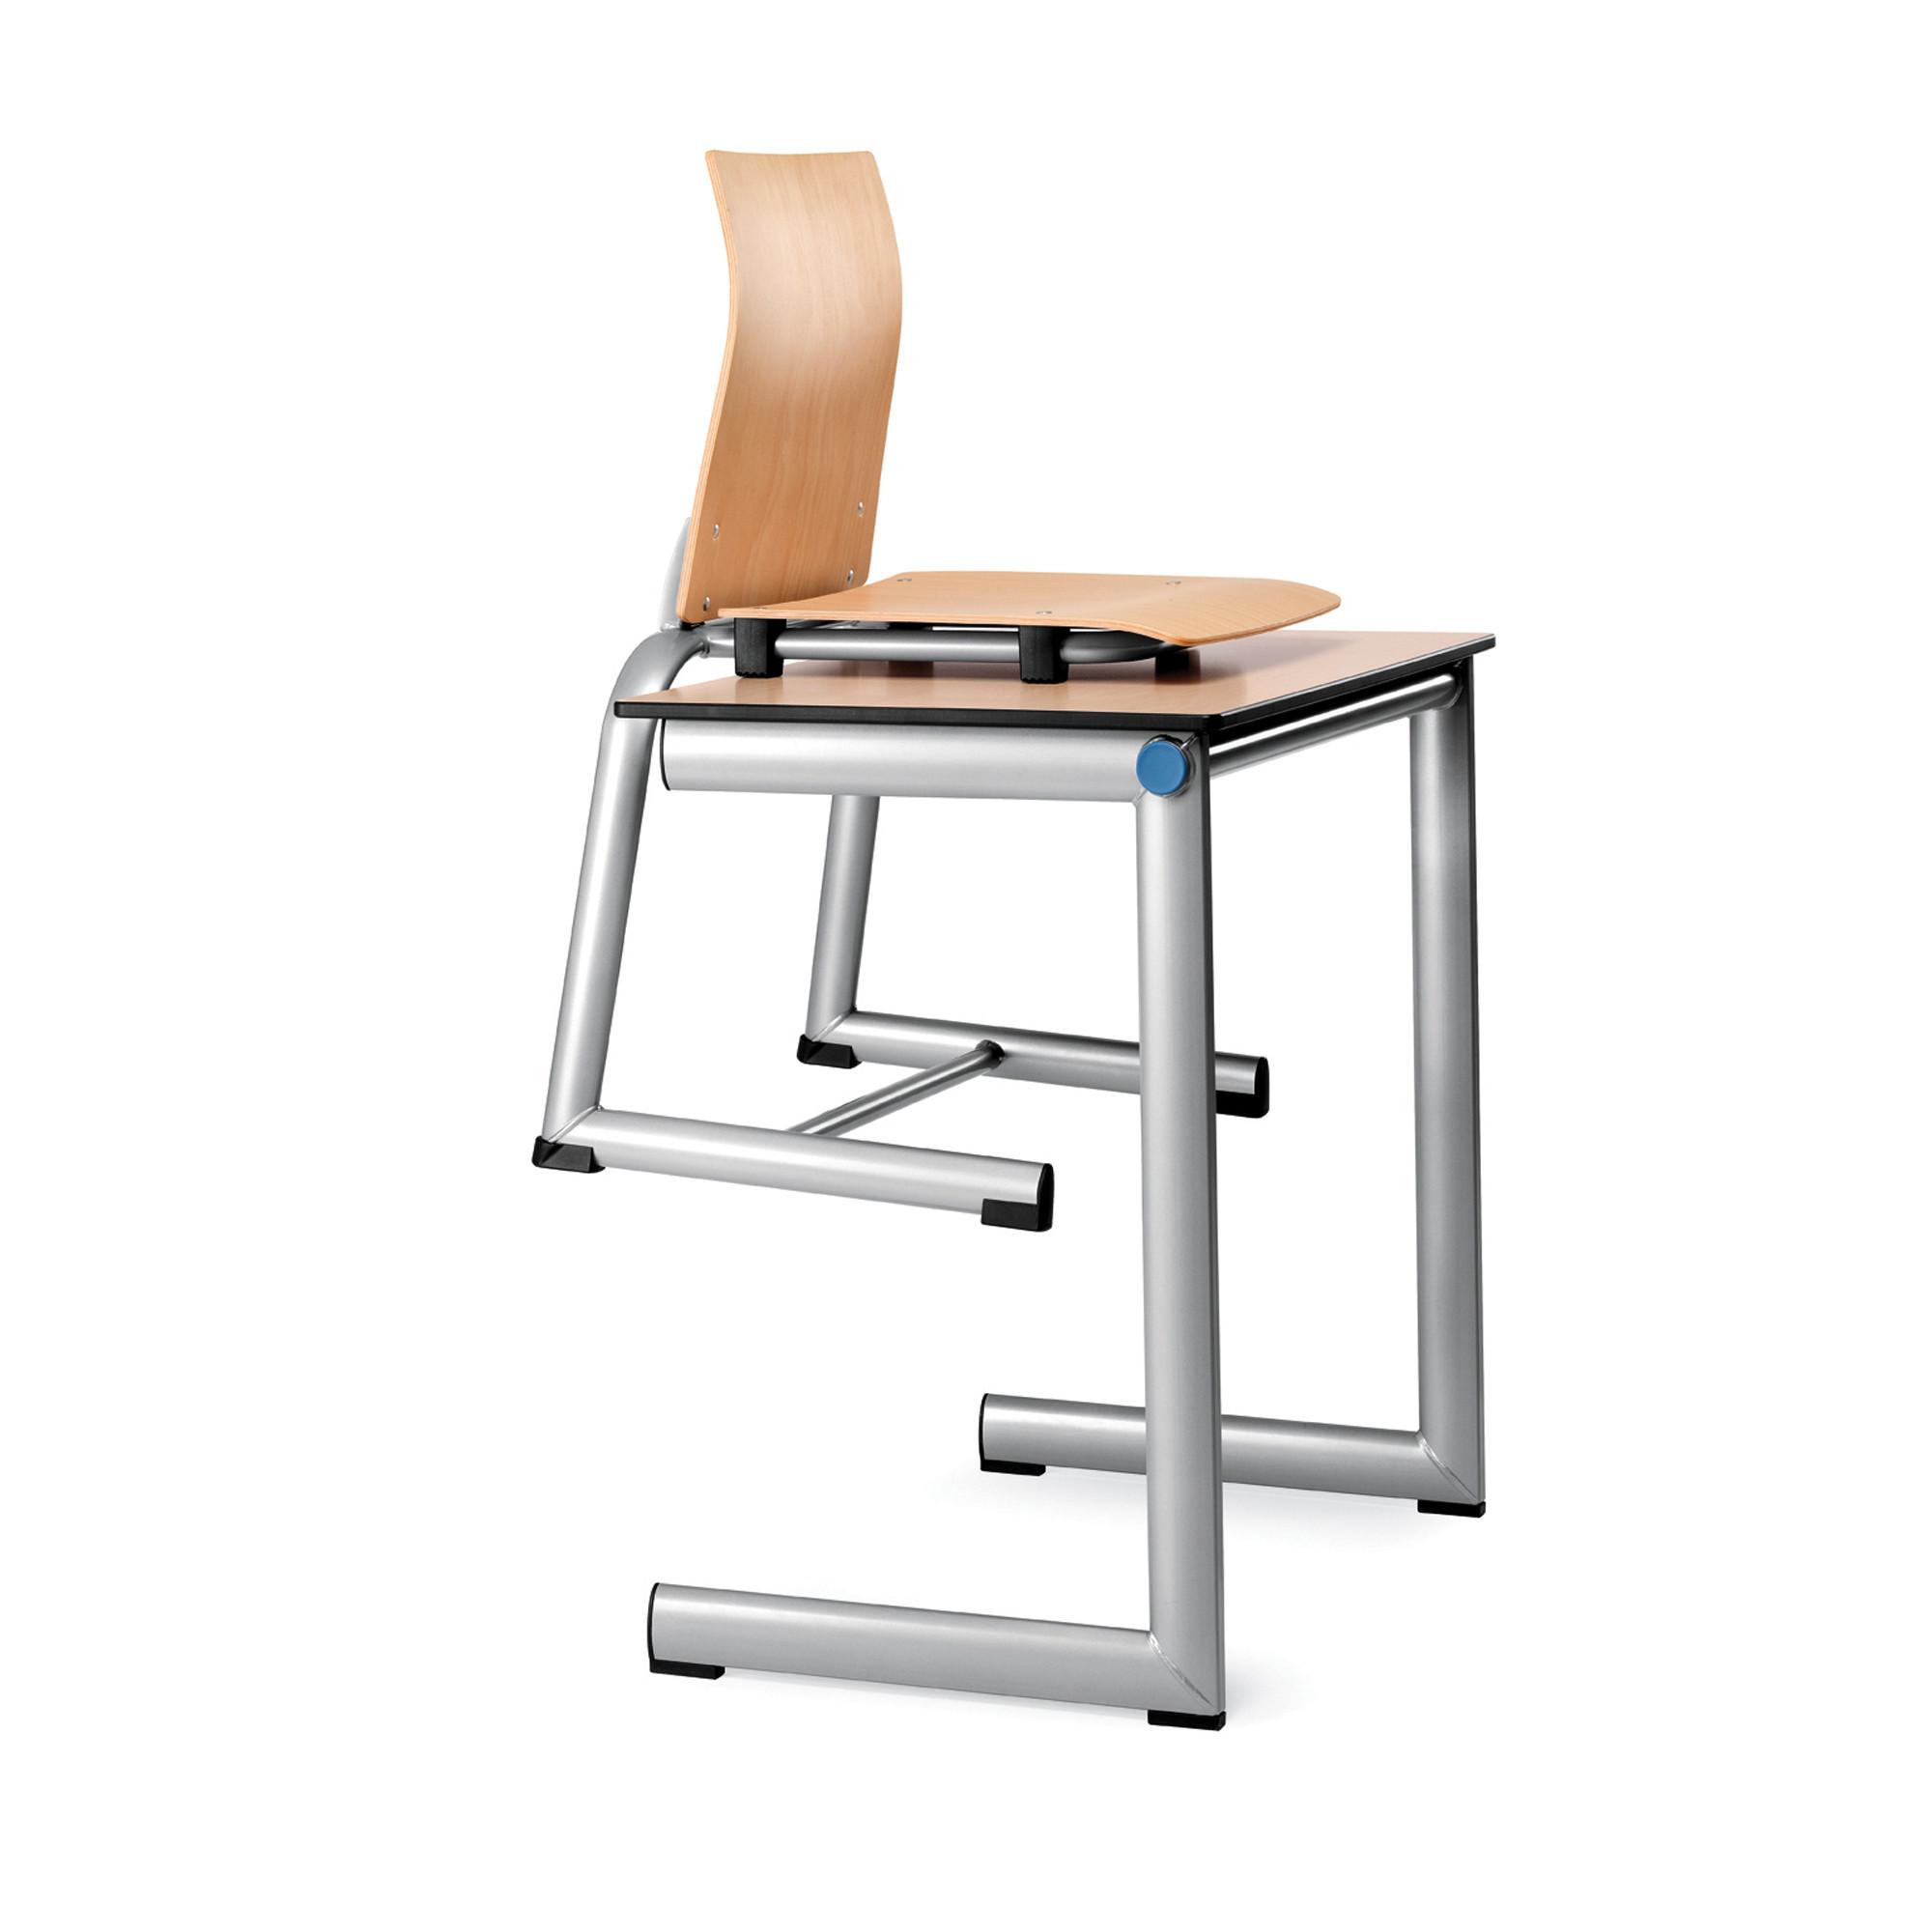 Ahrend 452 School Desks